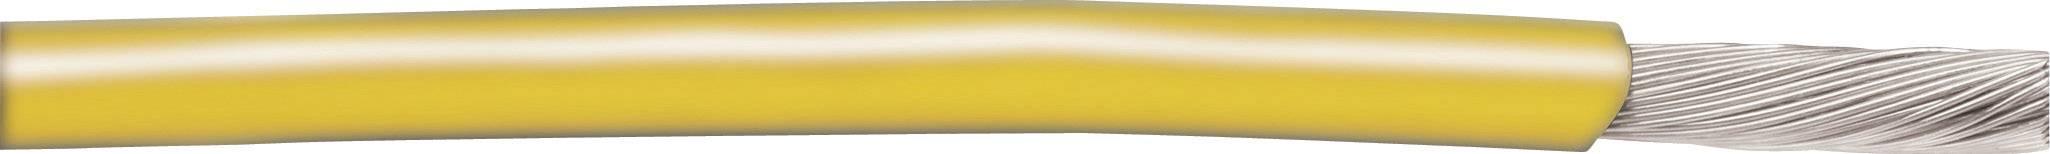 Pletenica EcoWire 1 x 2.08 mm, rumena AlphaWire 6717 30.5 m